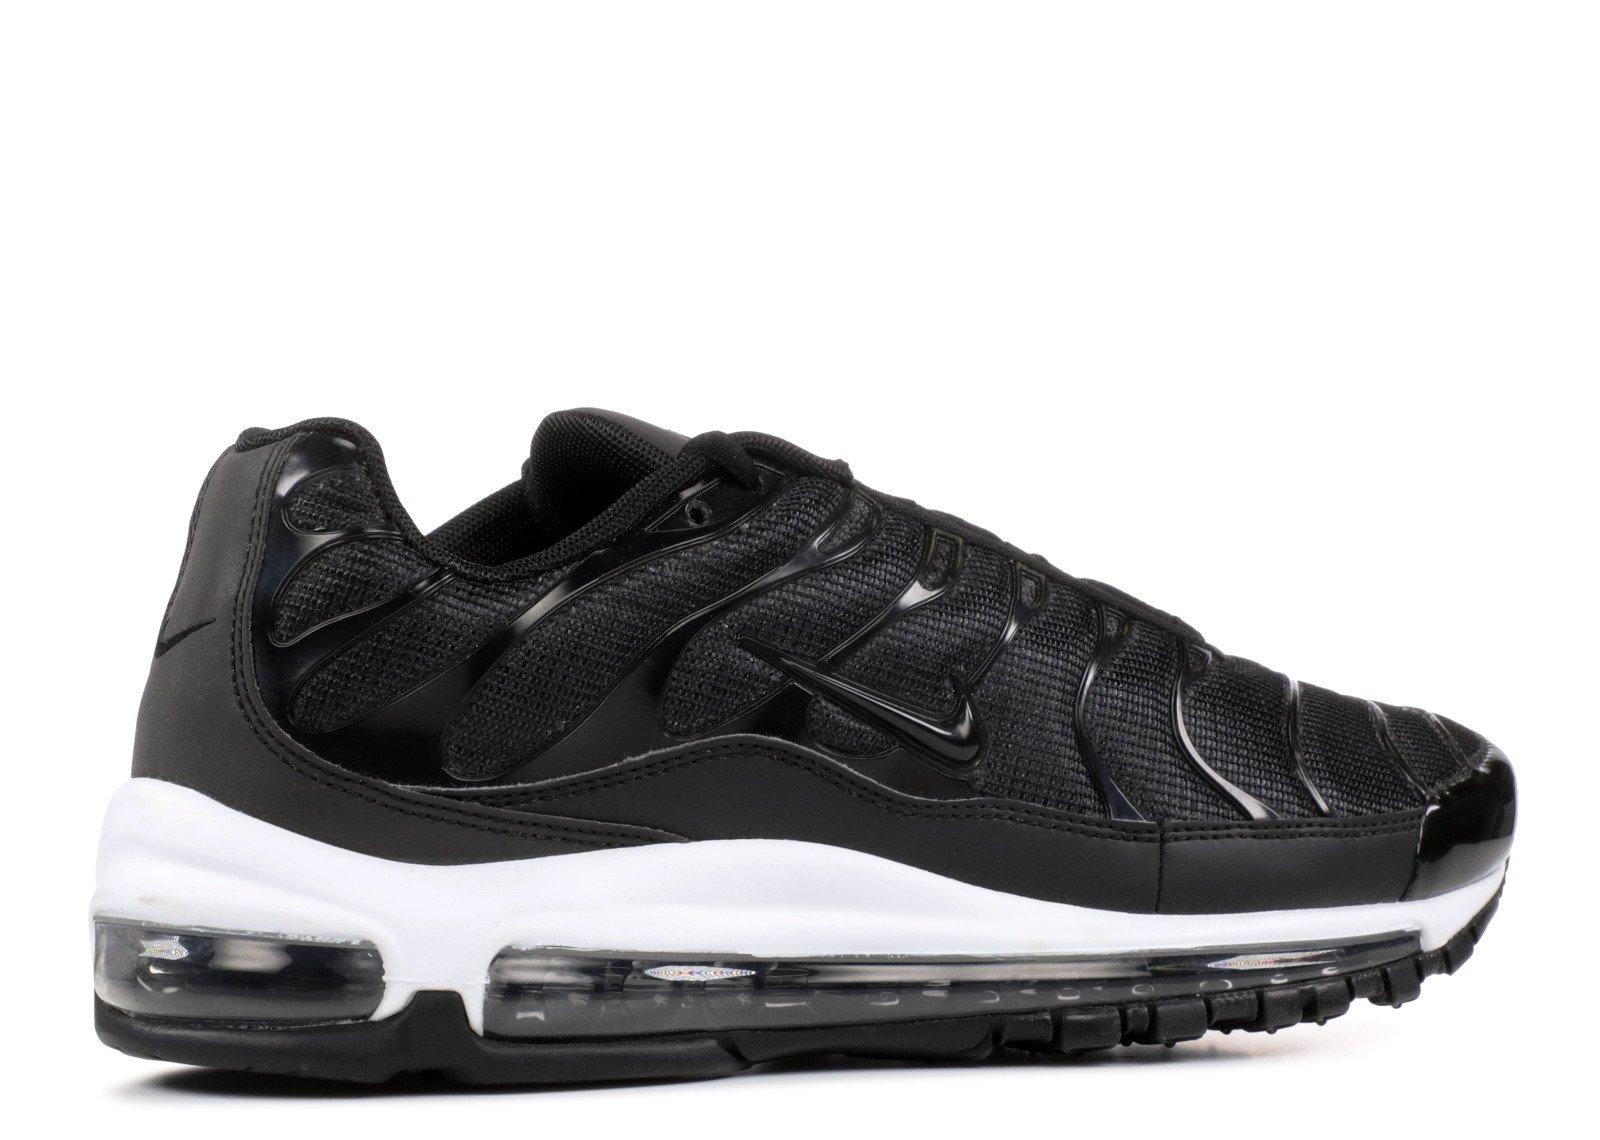 71%2Broe4XcXL - Nike Air Max 97 / Plus Mens Running Trainers Ah8144 Sneakers Shoes